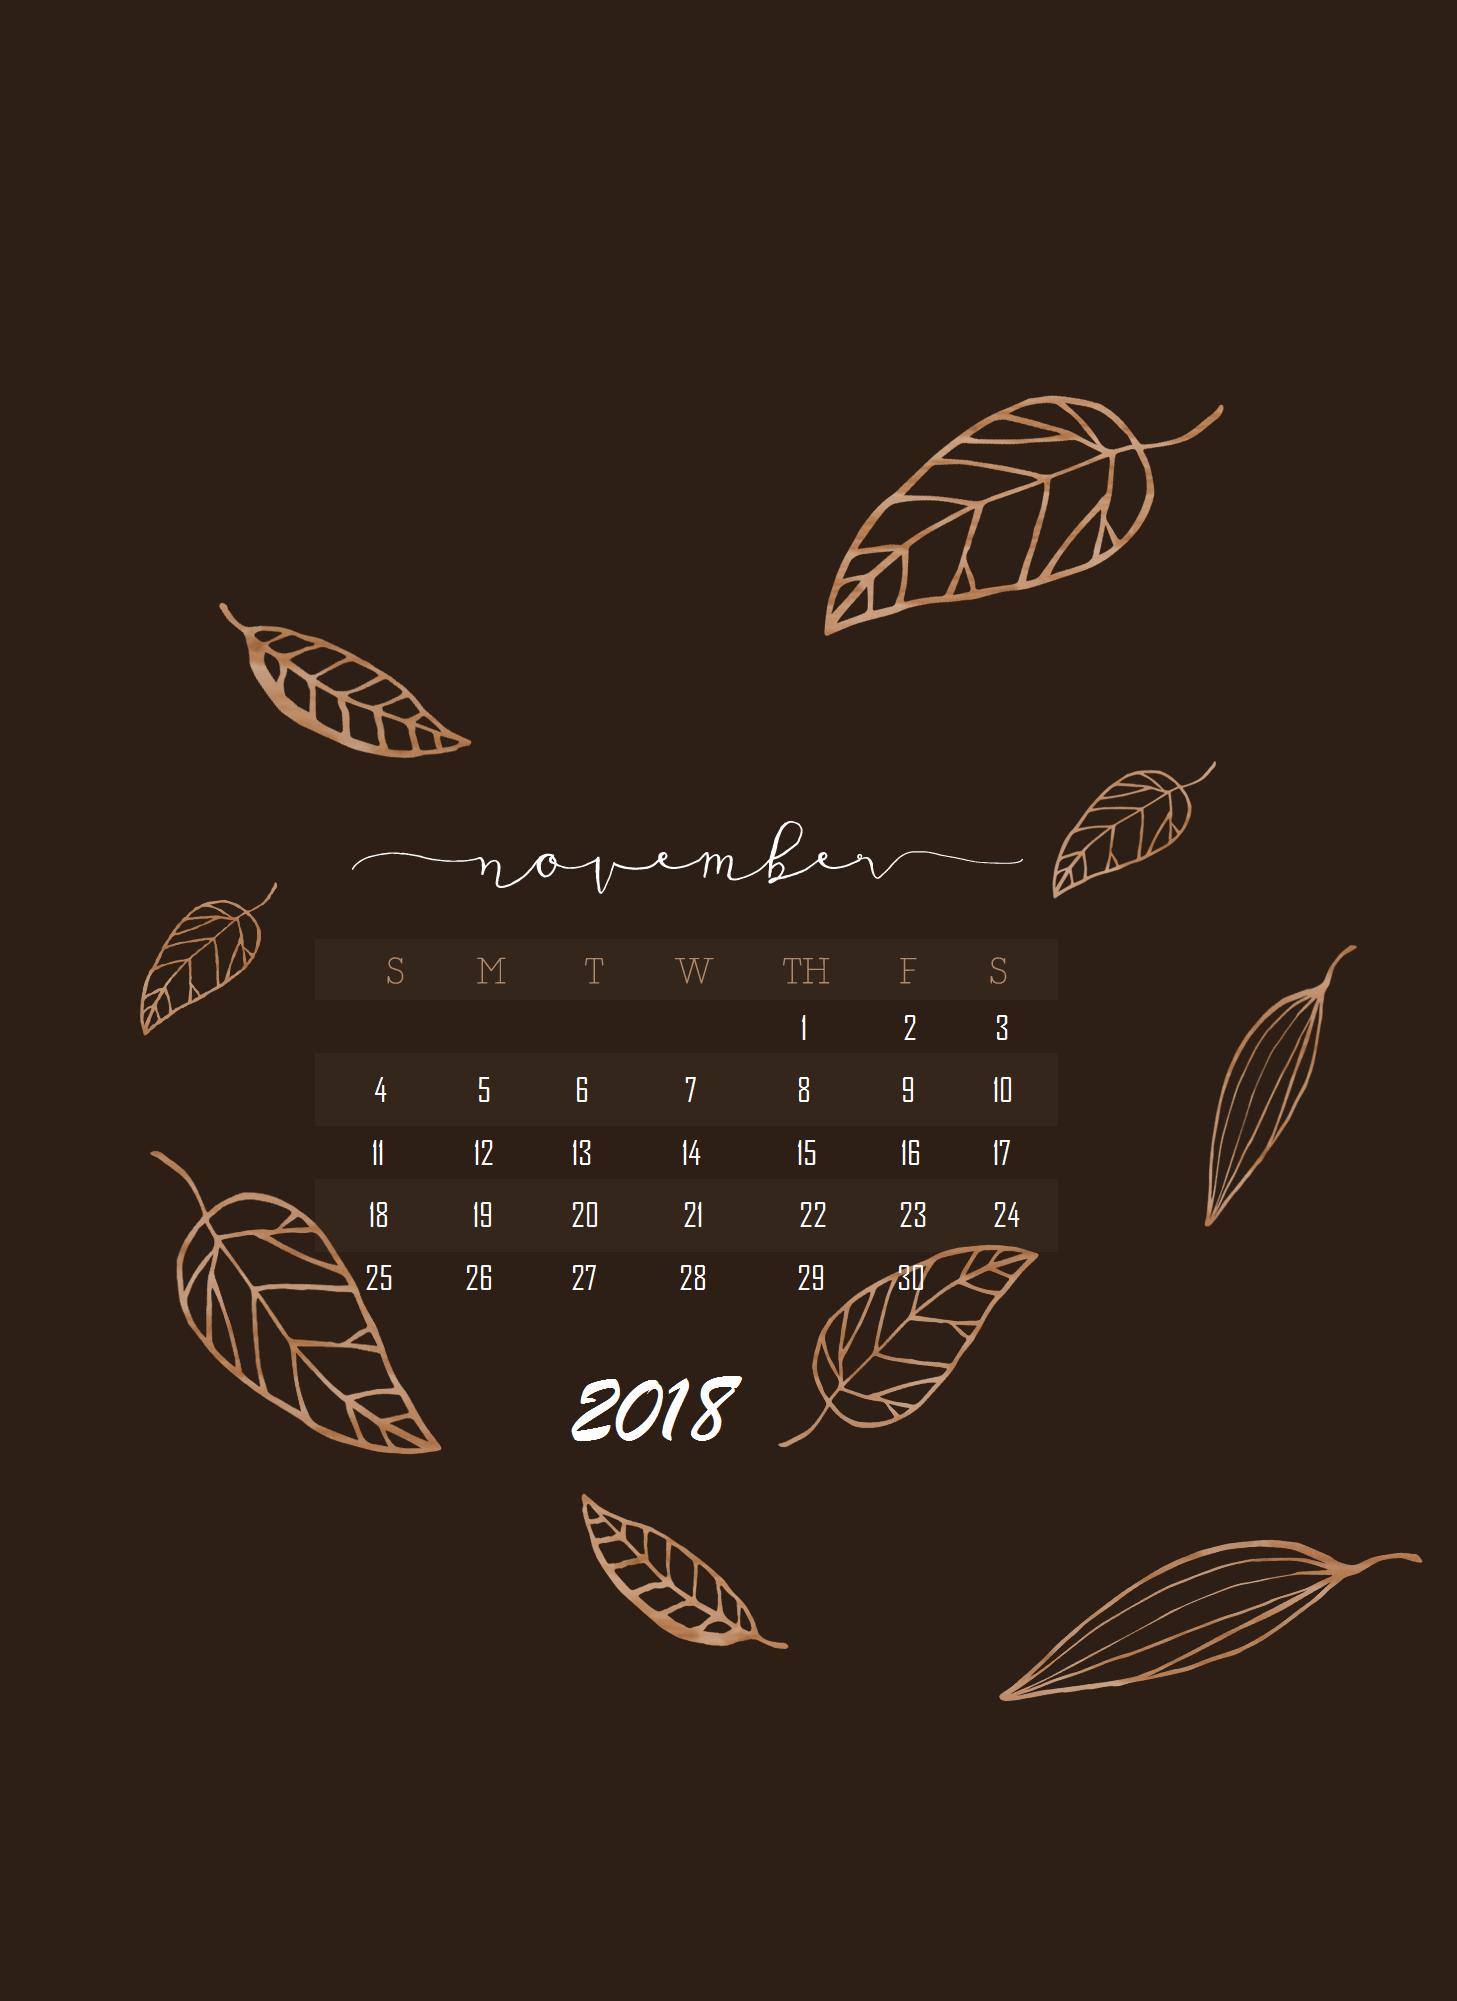 November 2018 iPhone Calendar Wallpaper